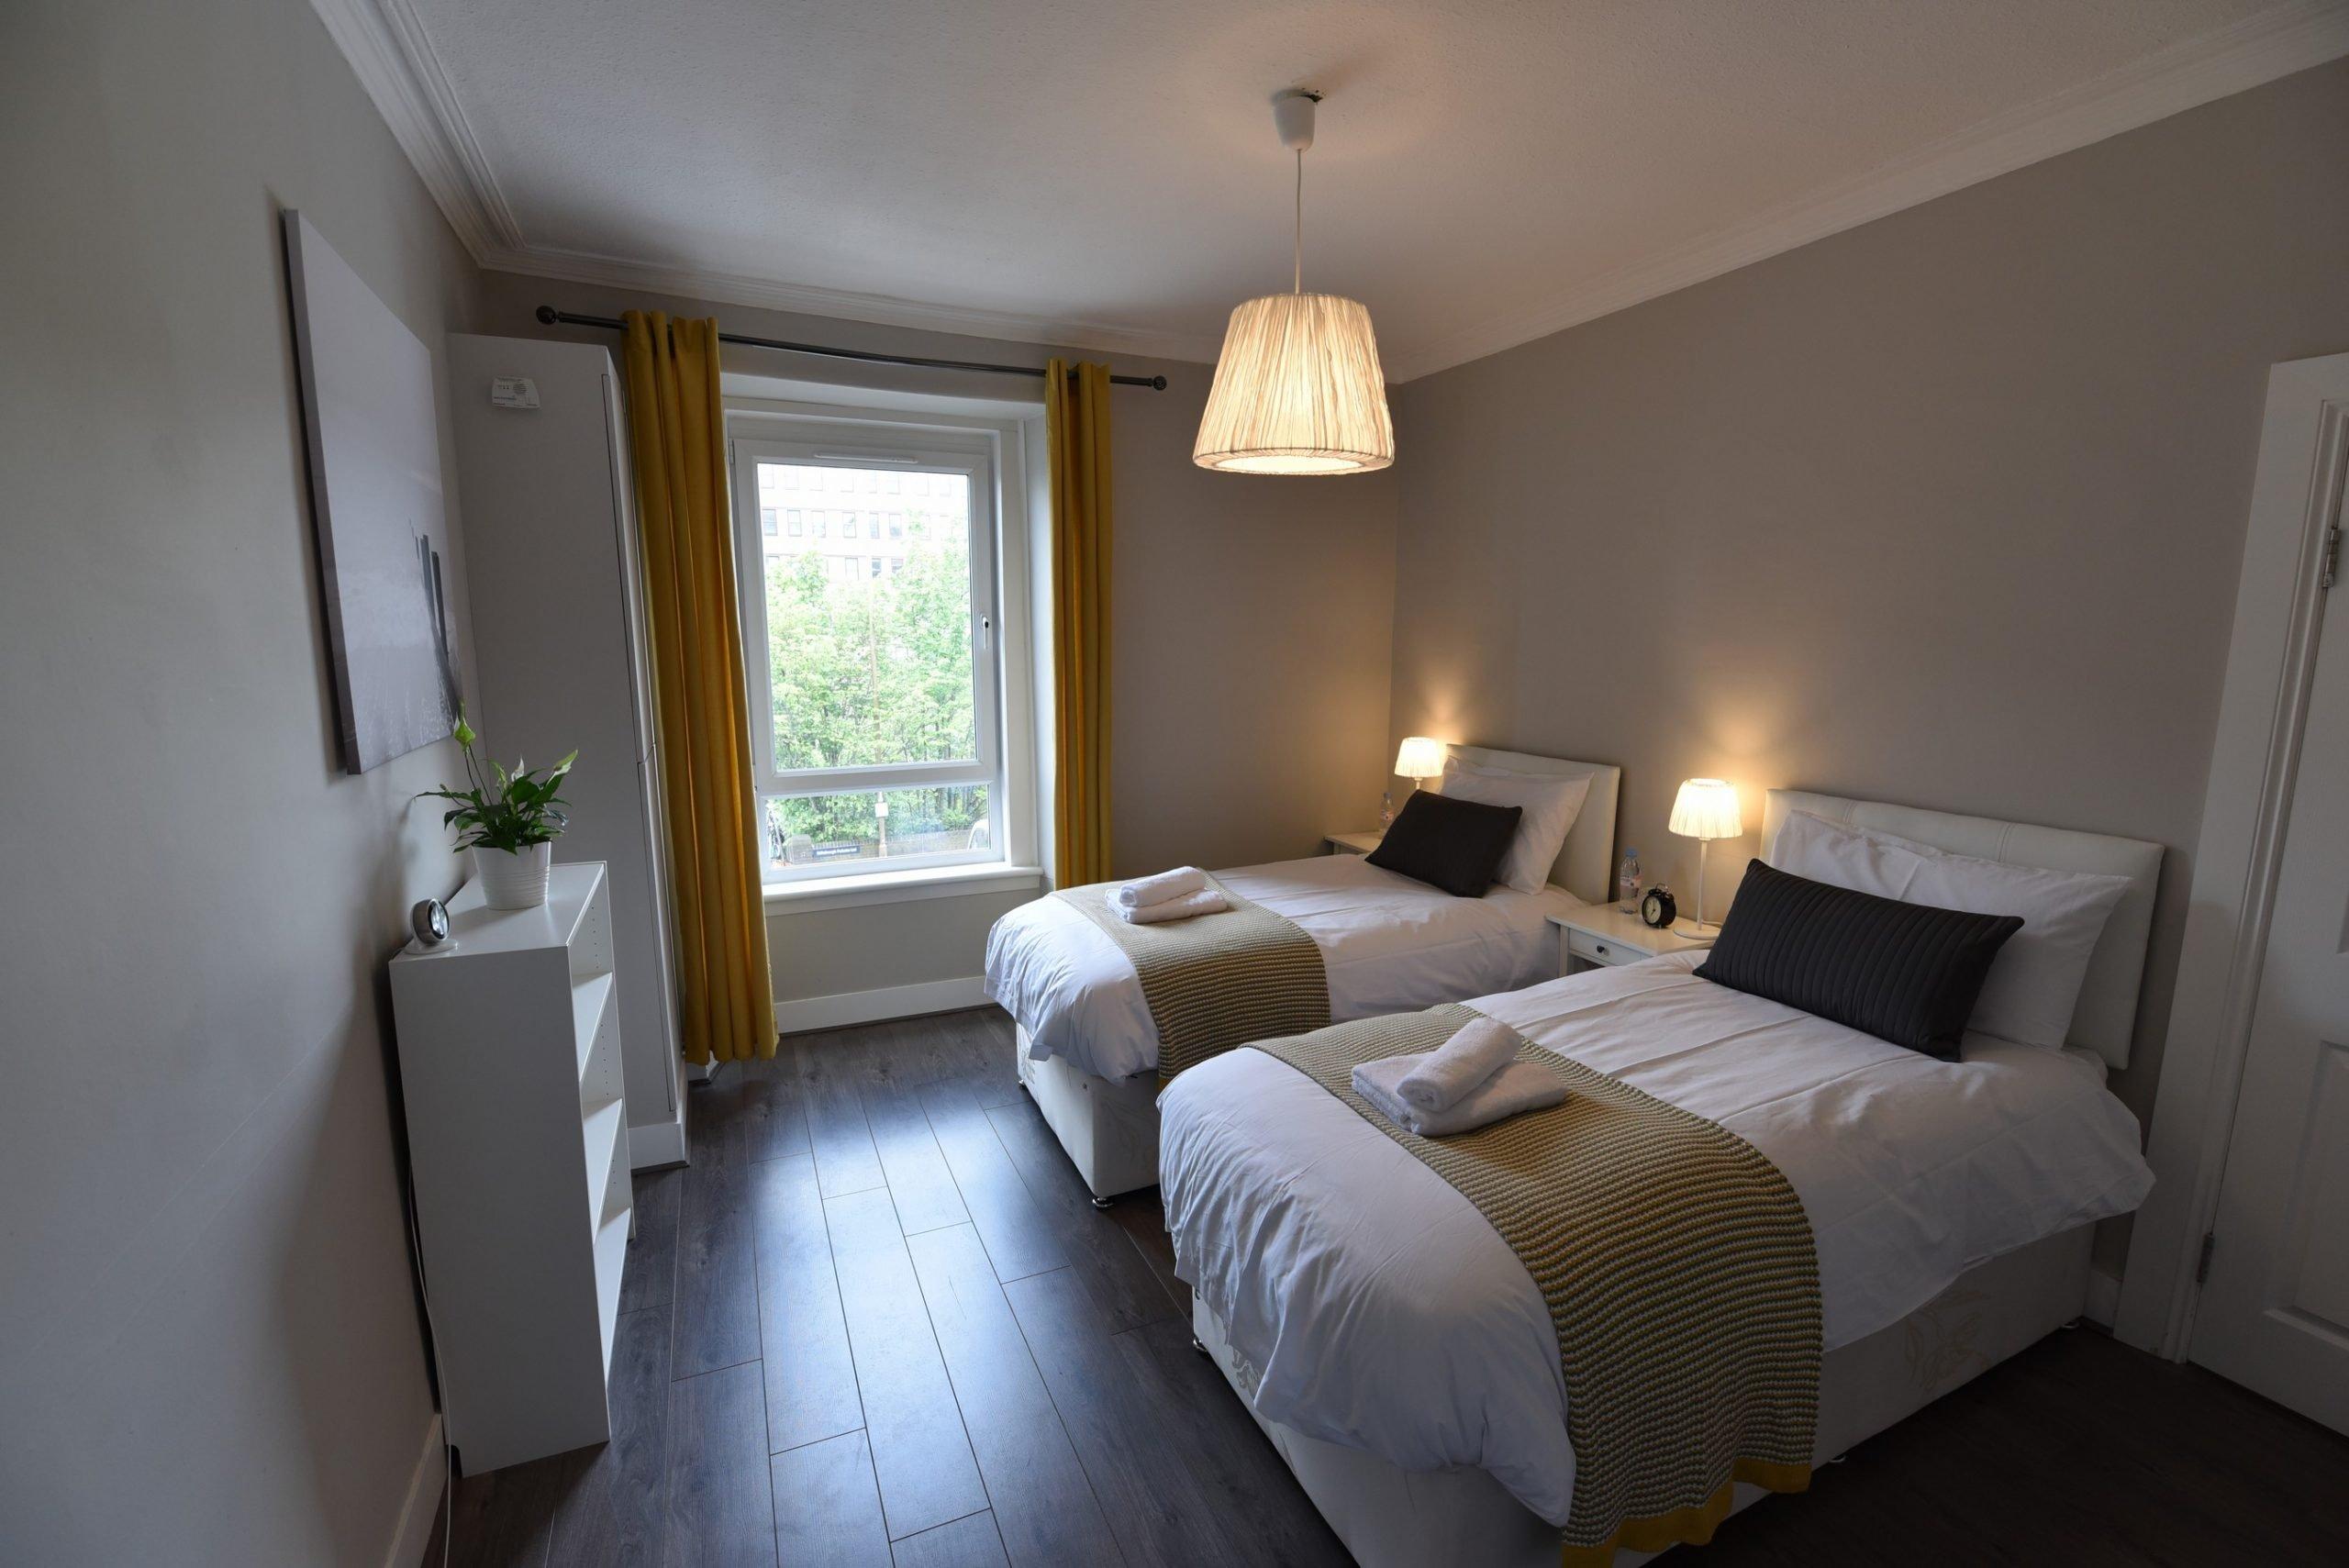 First_Apartments_Edinburgh_Meadowbank_Apartment - DSC_5335.jpg